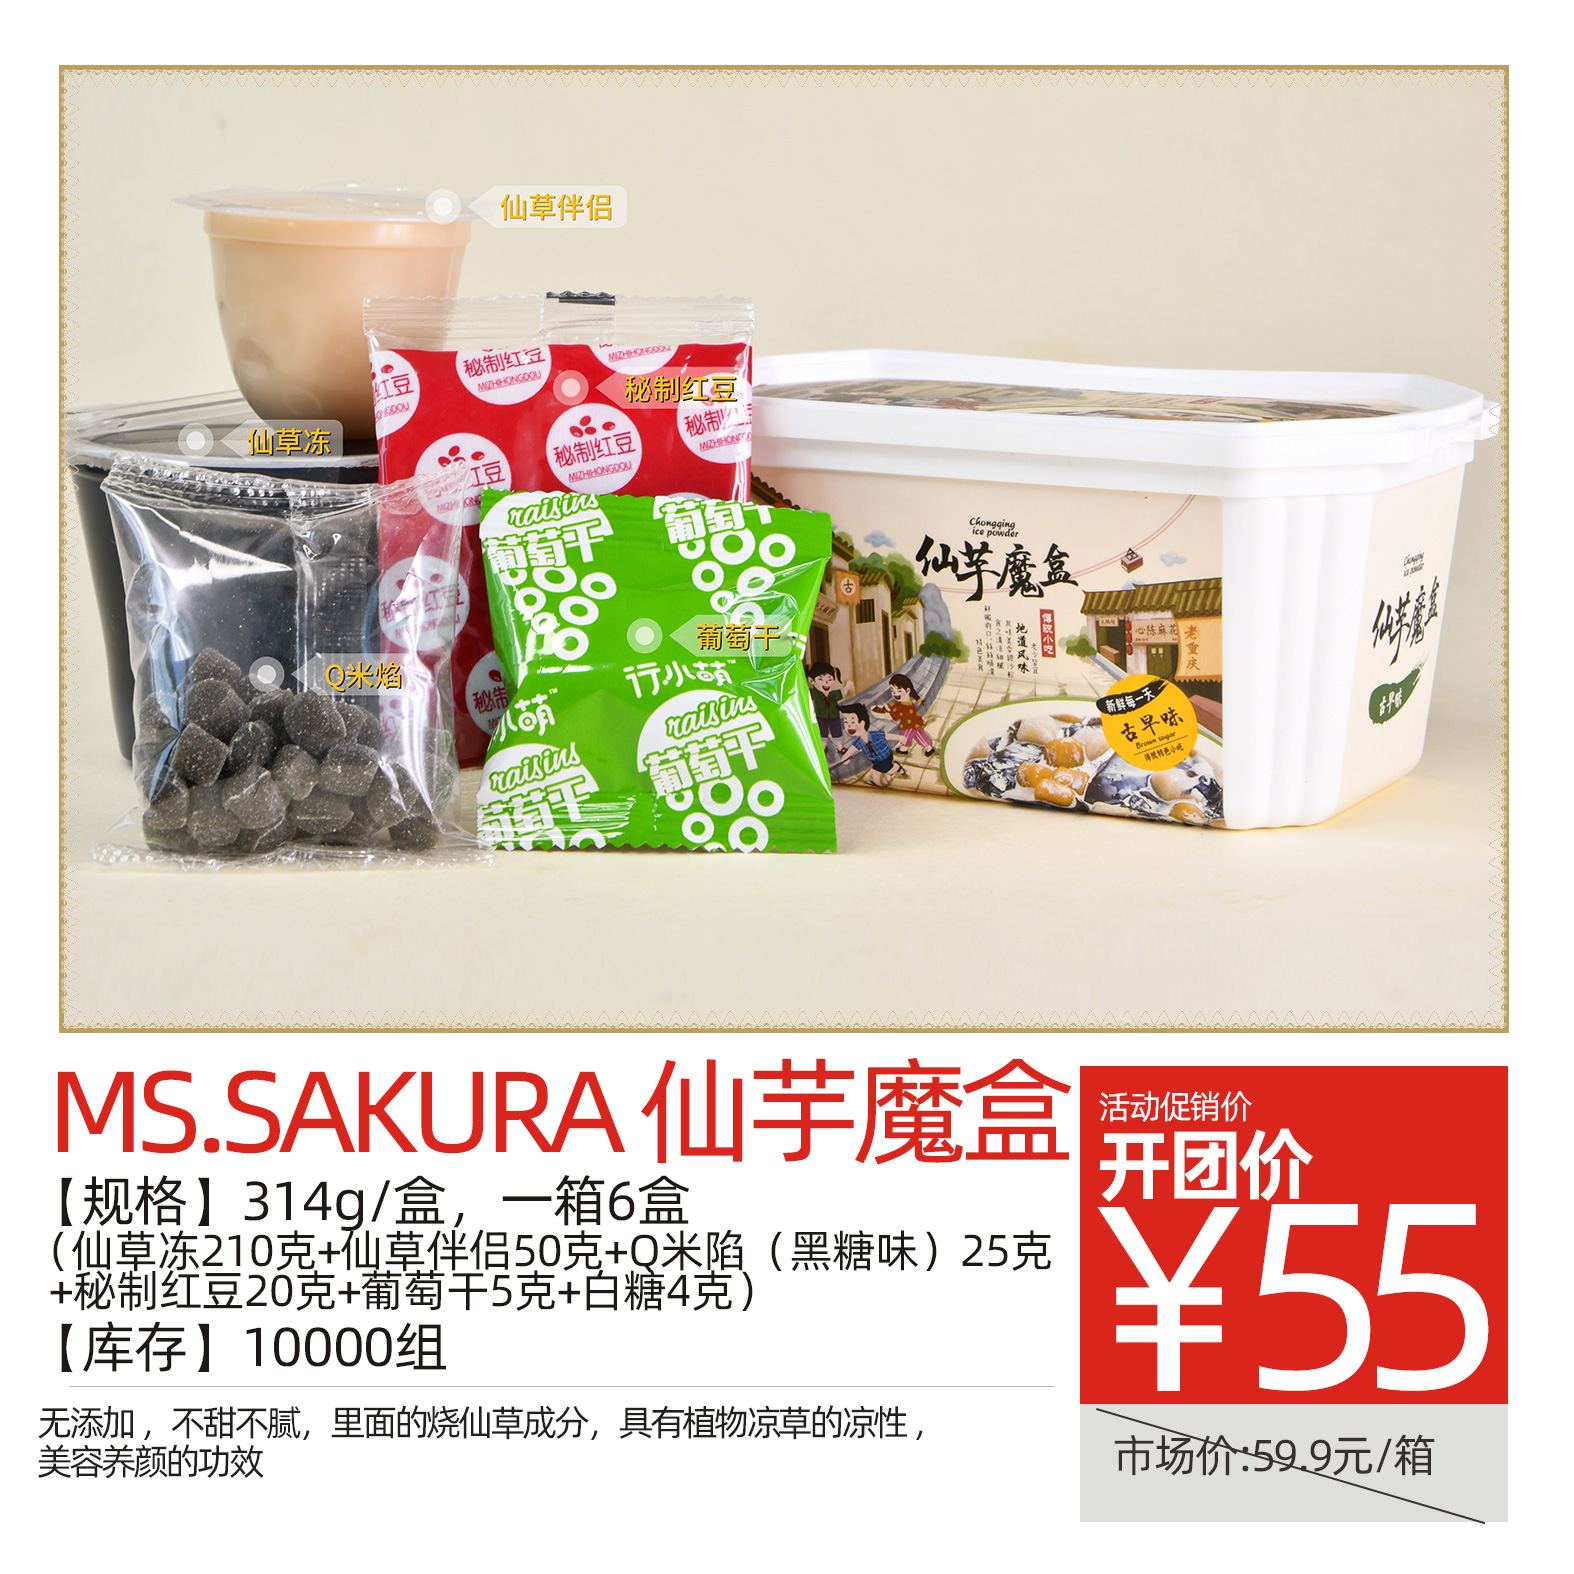 Ms.Sakura仙芋魔盒